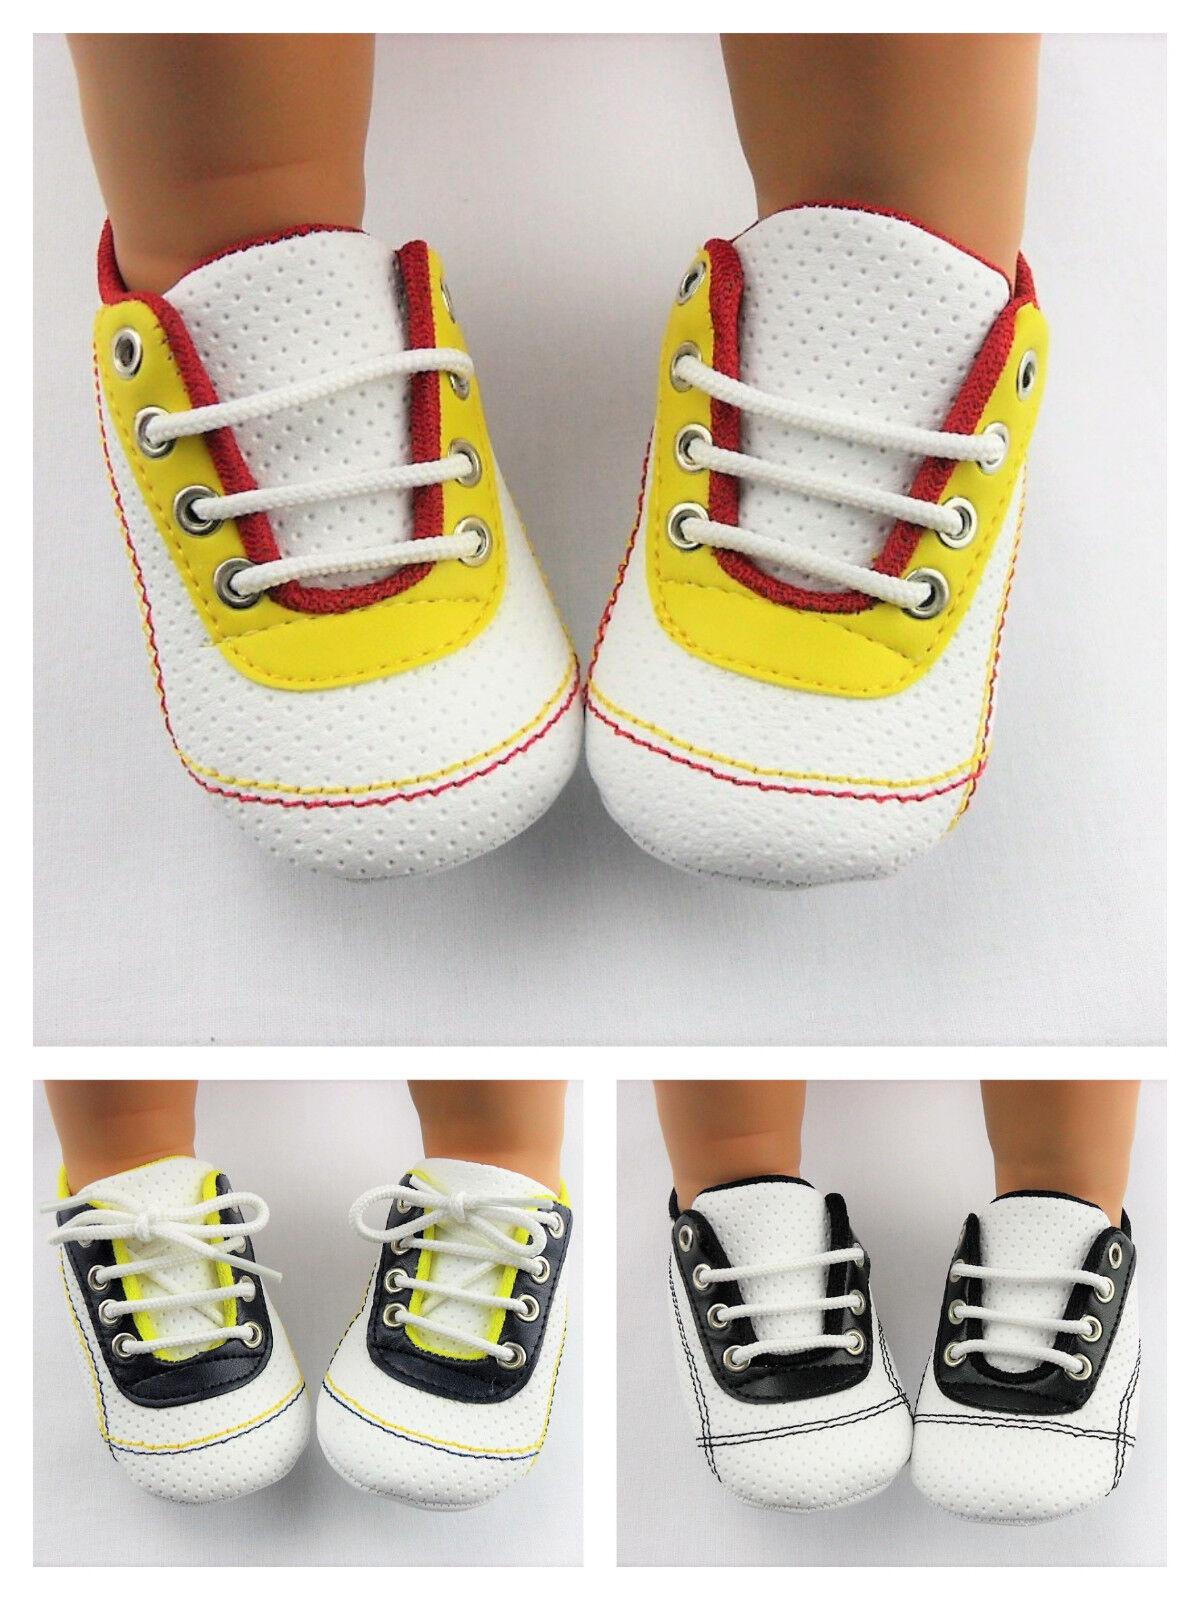 Baby Schuhe Babyschuhe Fanatik Fenerbahce Galatasaray Besiktas Gr. 17 18 19